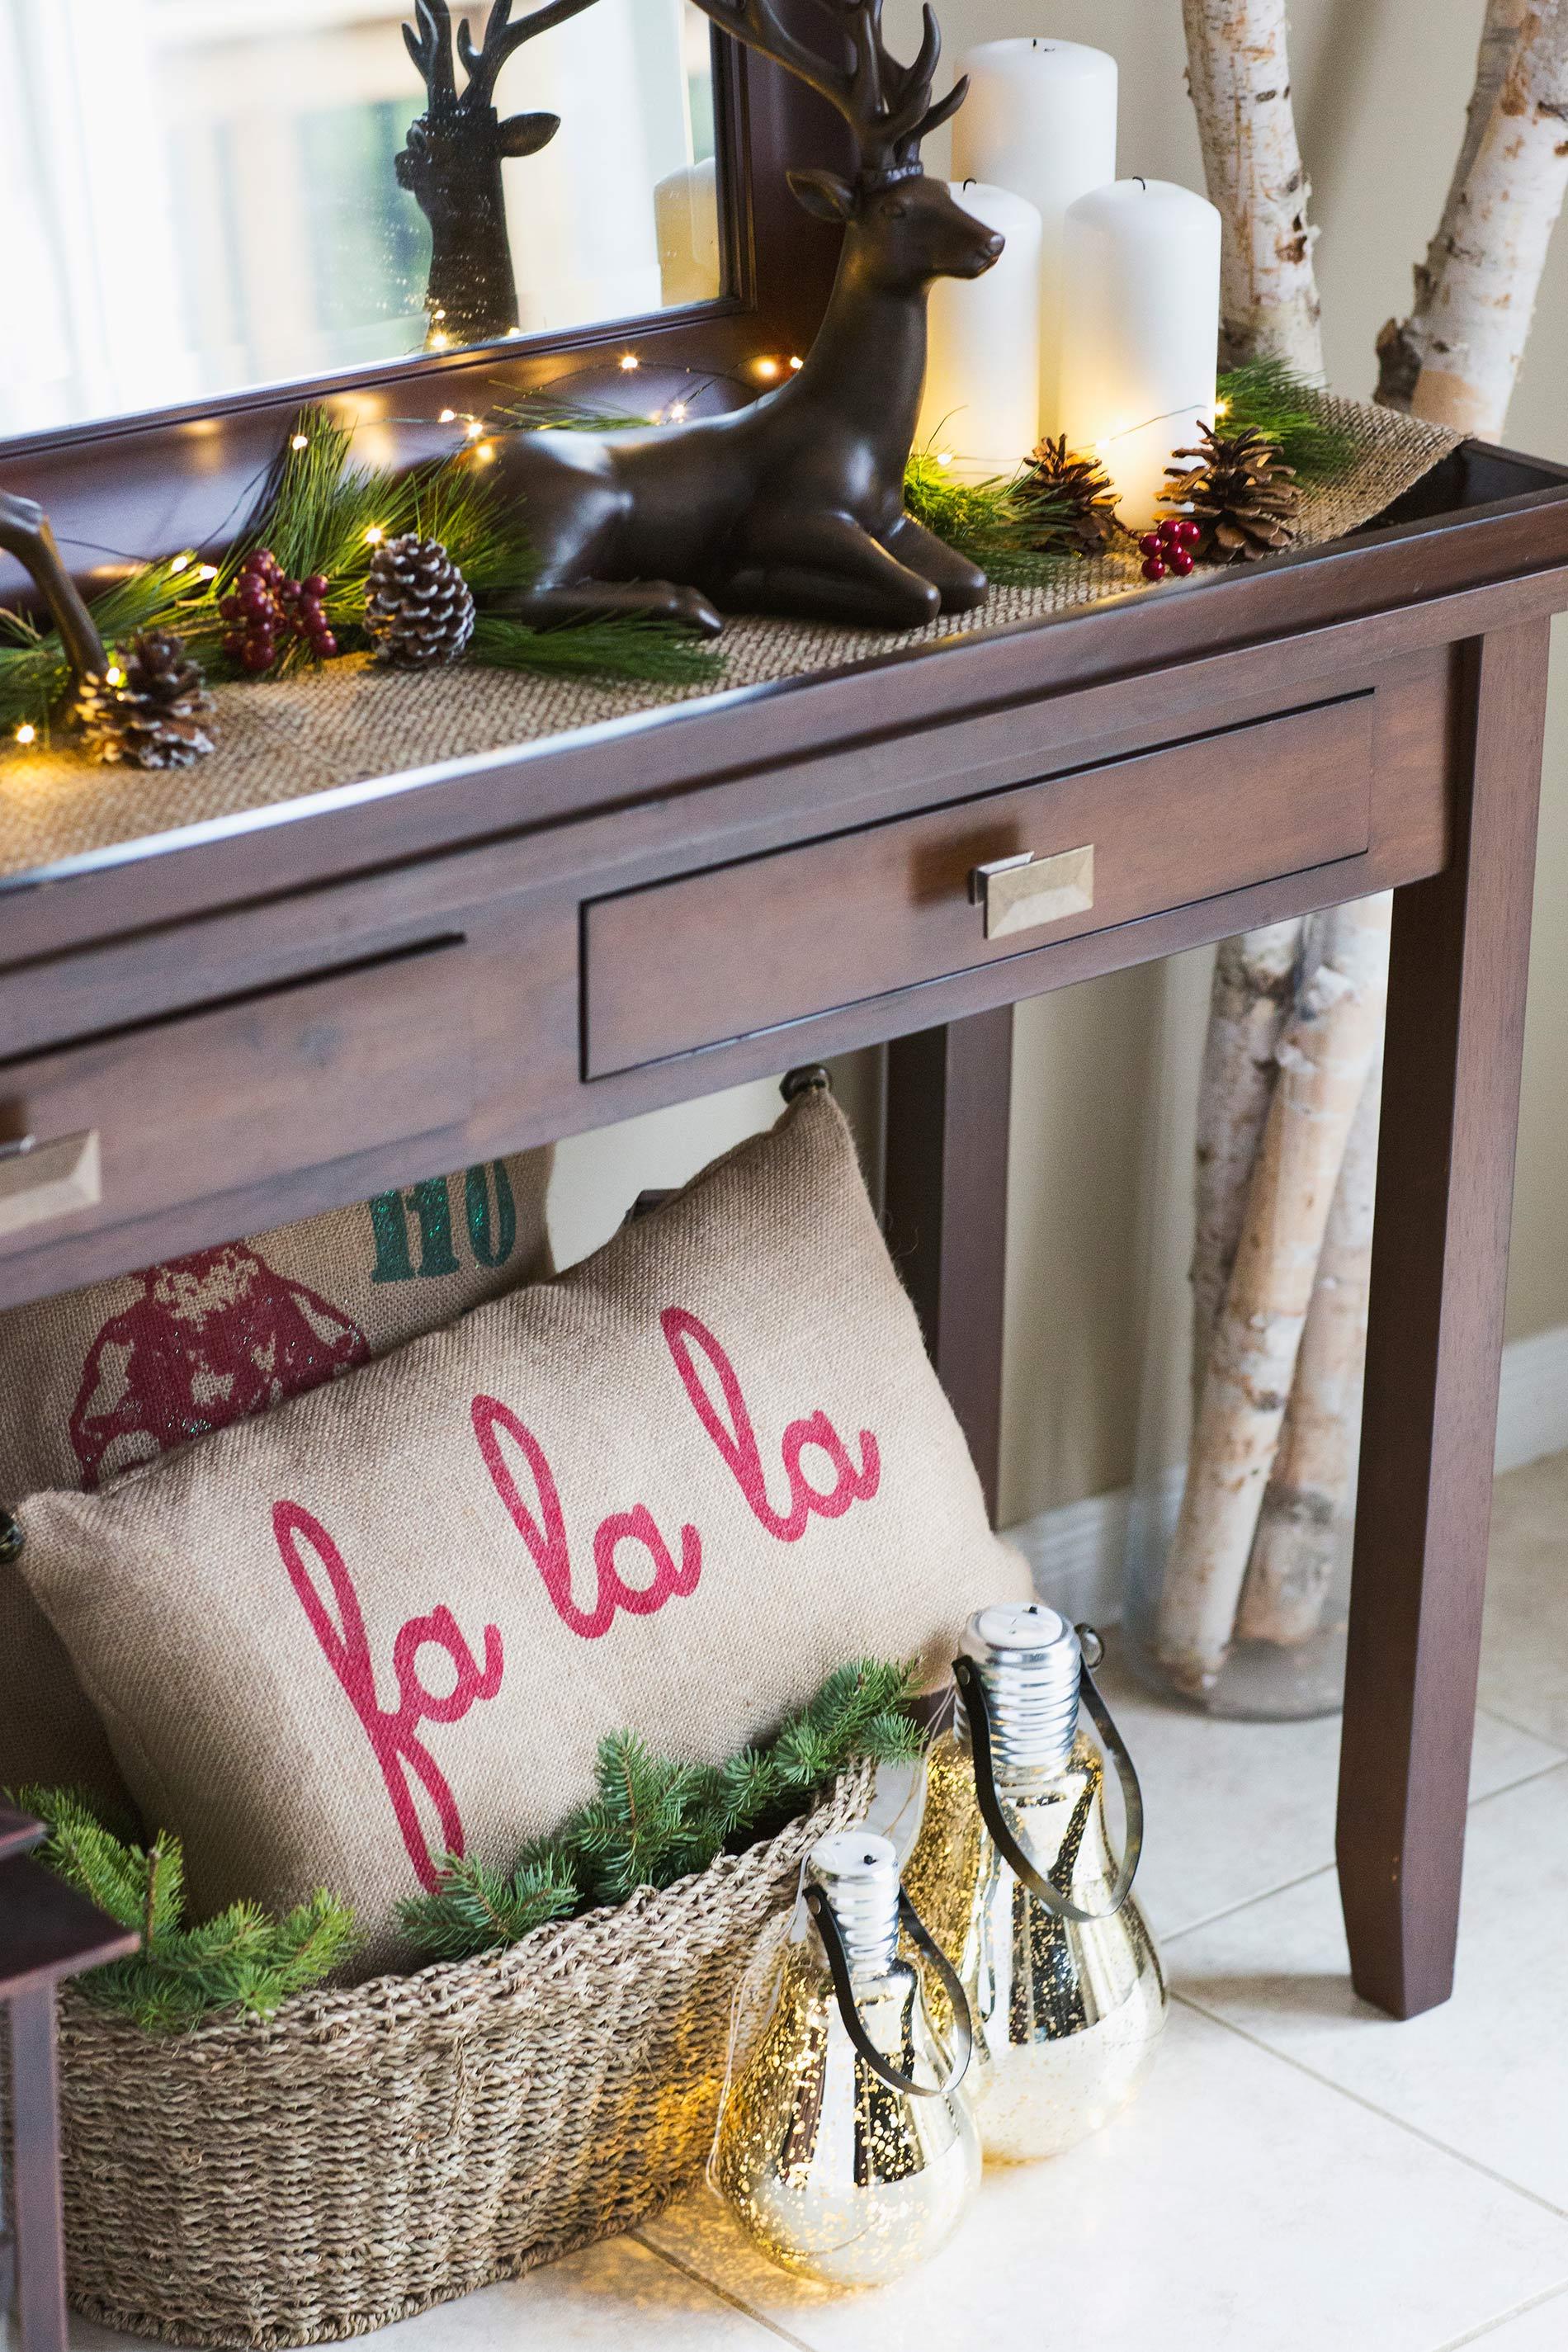 Martha Stewart Christmas Decor from Home Depot